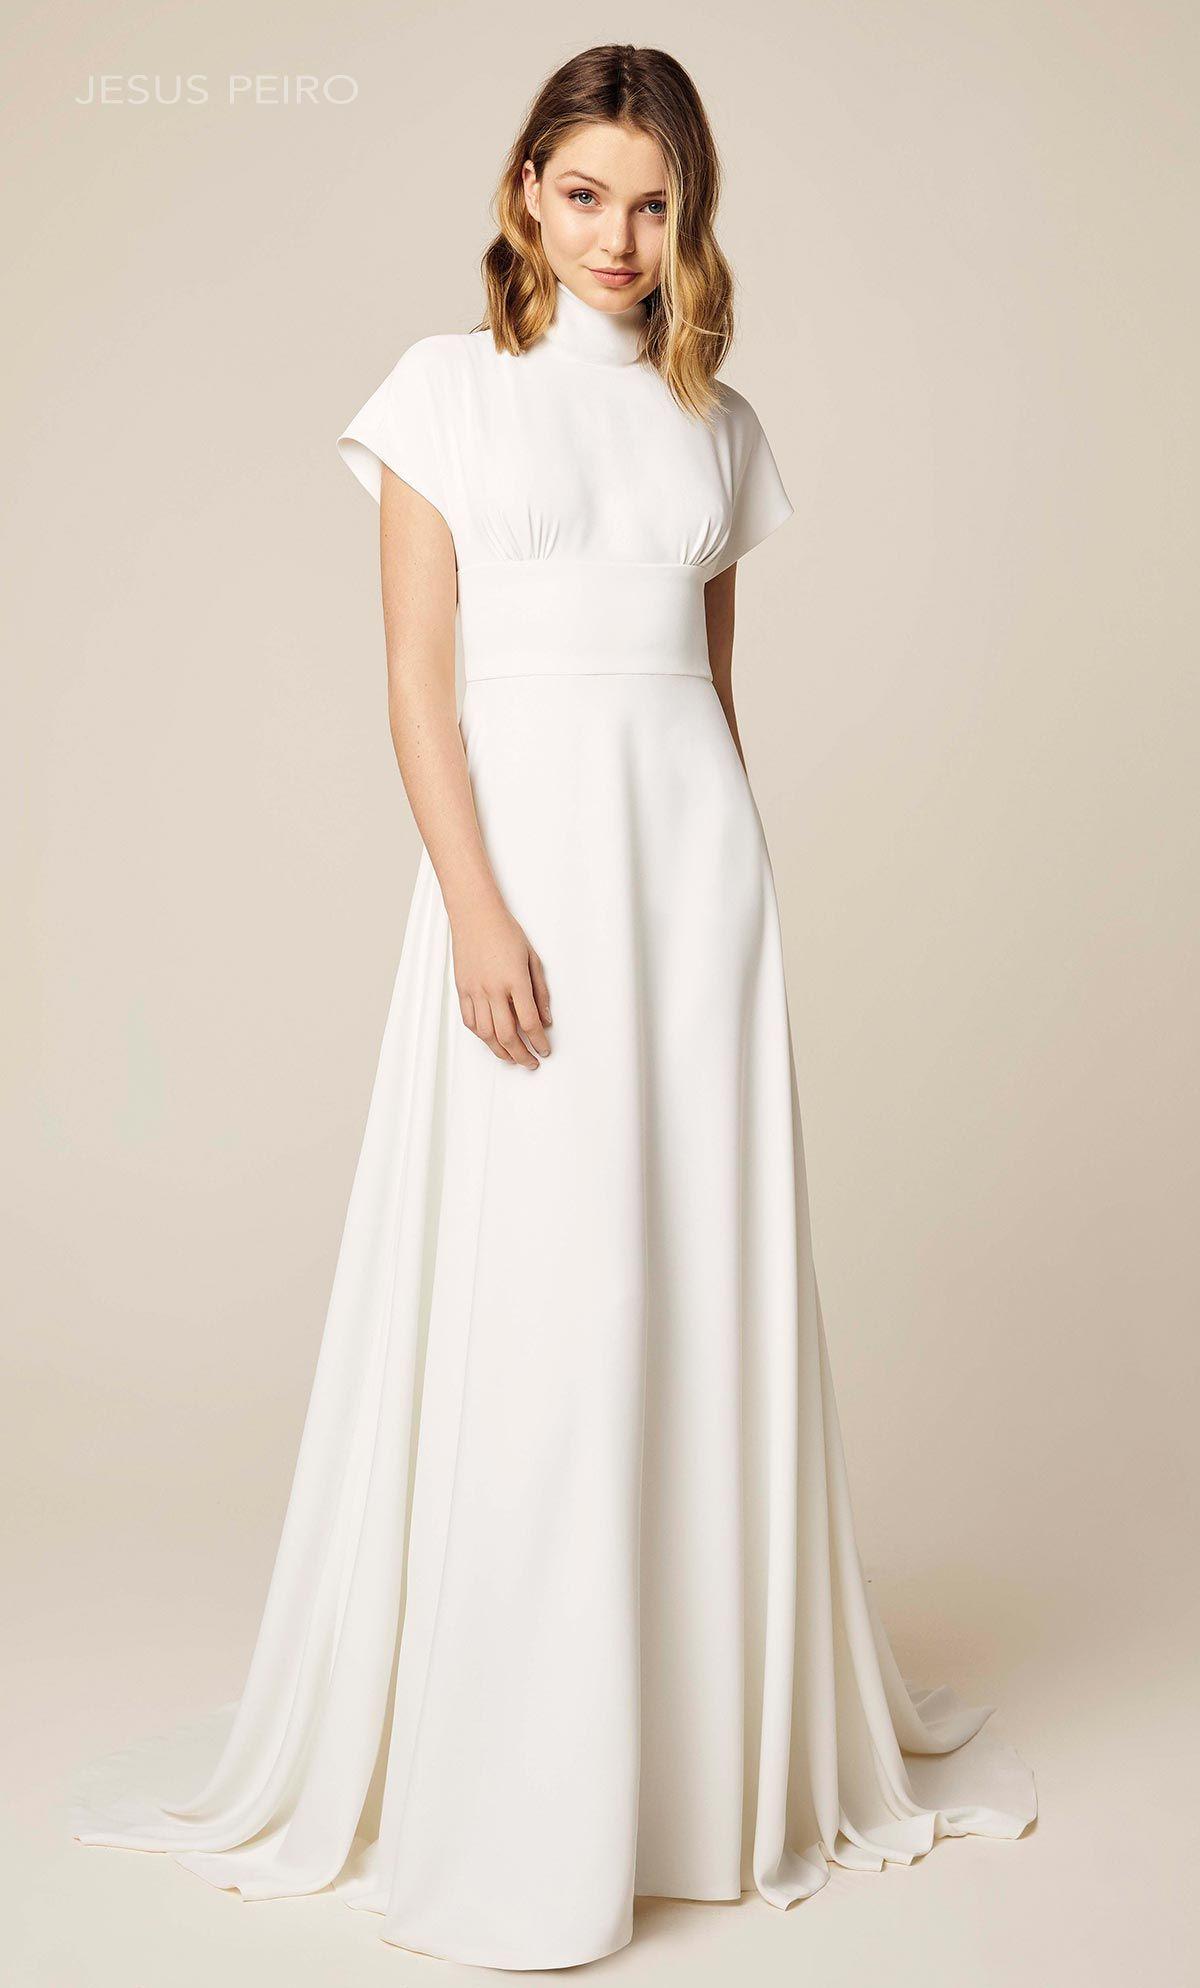 Modest Turtleneck Crepe Wedding Dress In 2020 Modern Wedding Dress Minimalist Wedding Dresses High Neck Wedding Dress